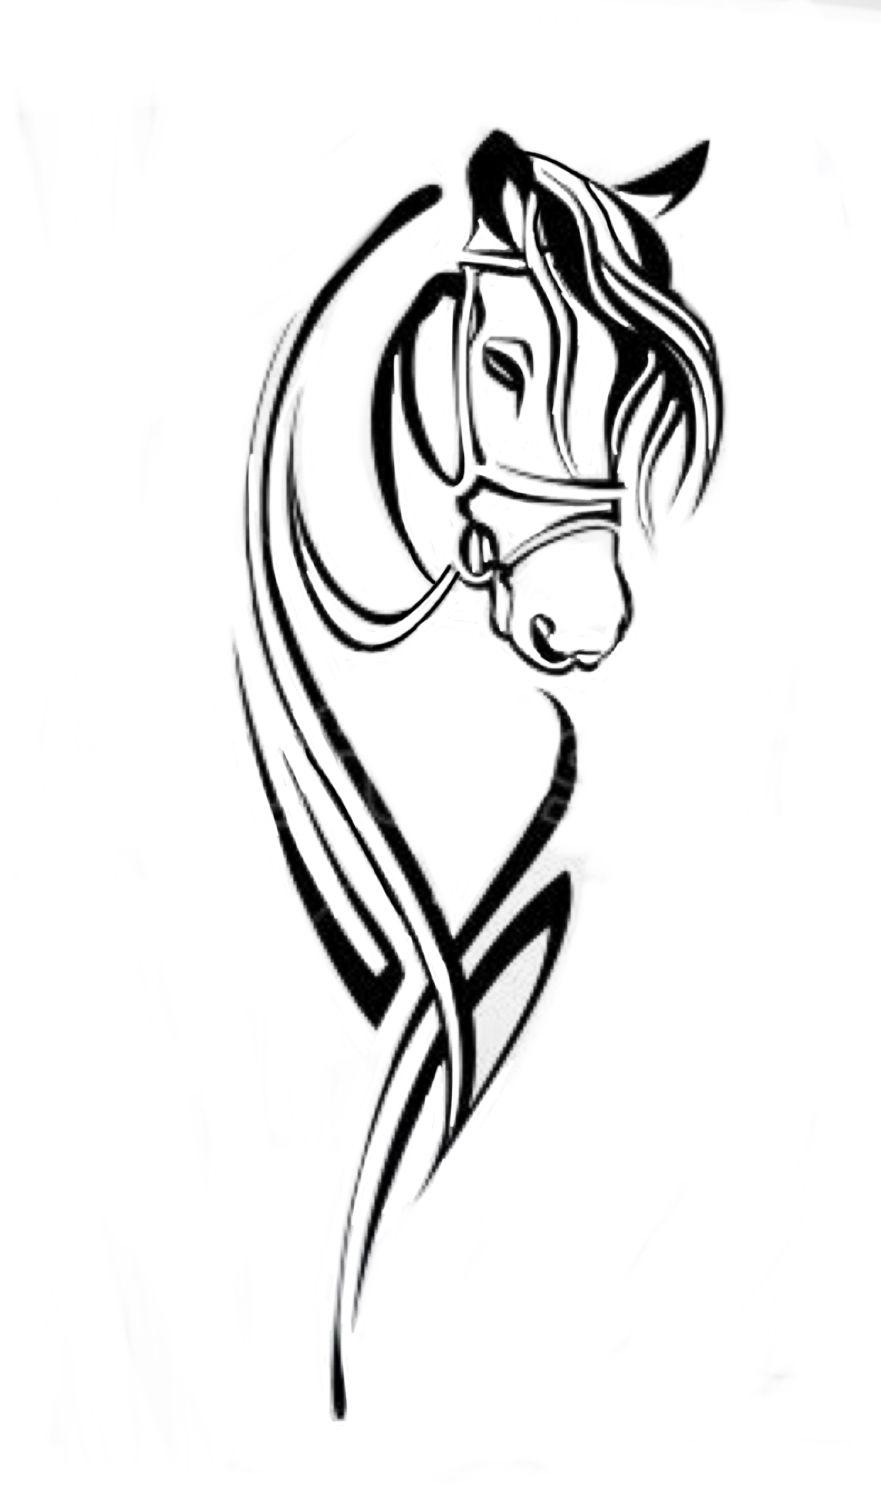 Pin By Ania Sloniowska On Silhouette Horse Tattoo Design Horse Art Print Horse Tattoo